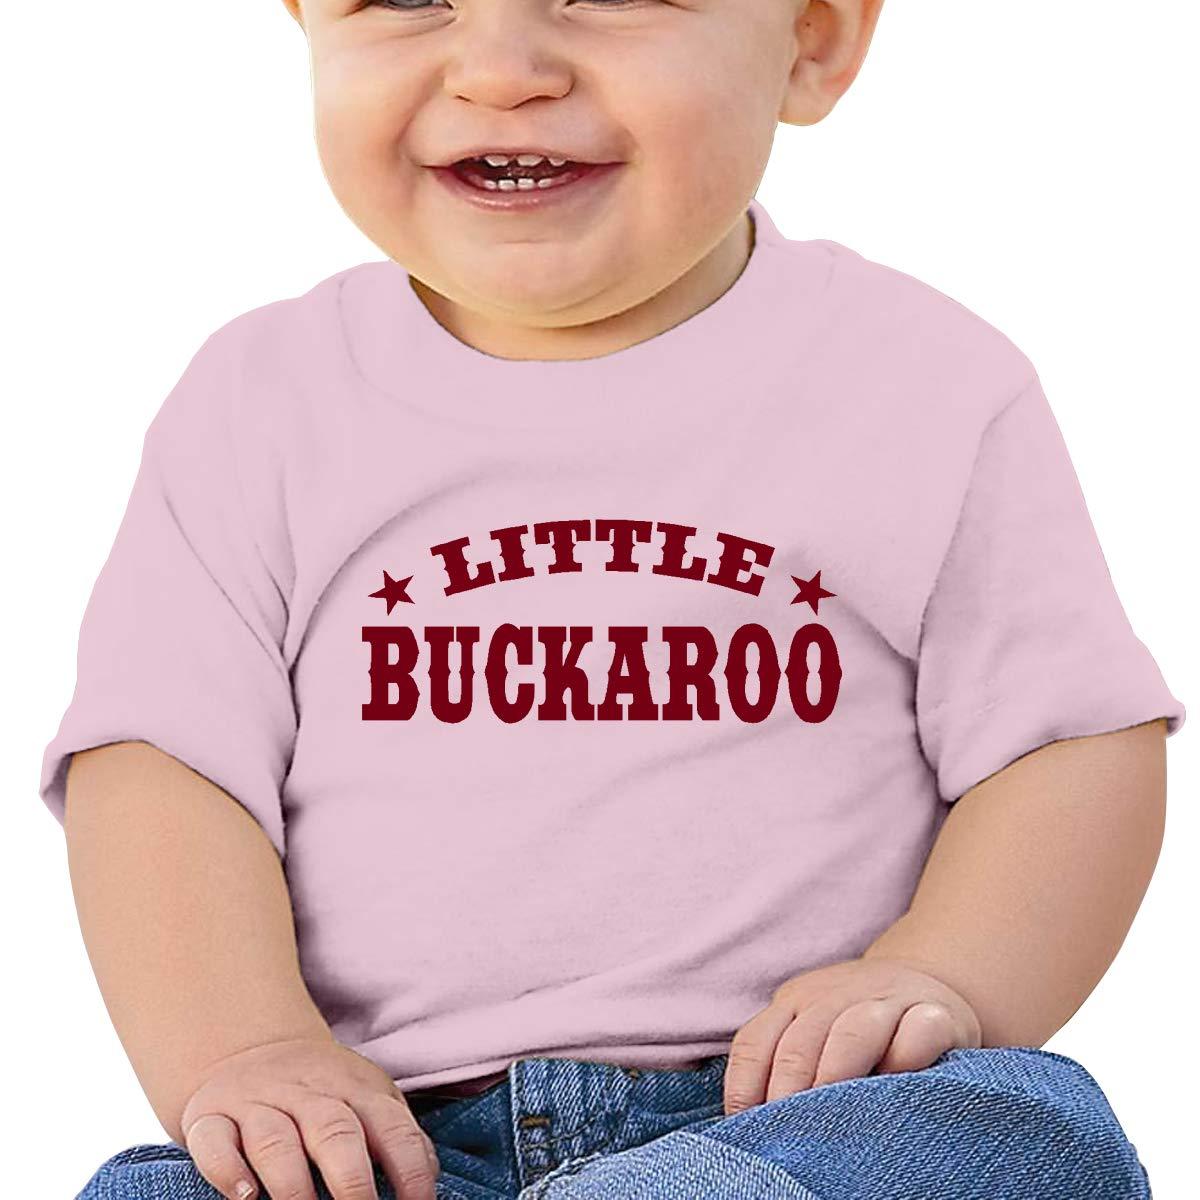 SDHEIJKY Little Buckaroo Baby Cotton Short Sleeve T-Shirt Cute Kids Top Blouse Shirts